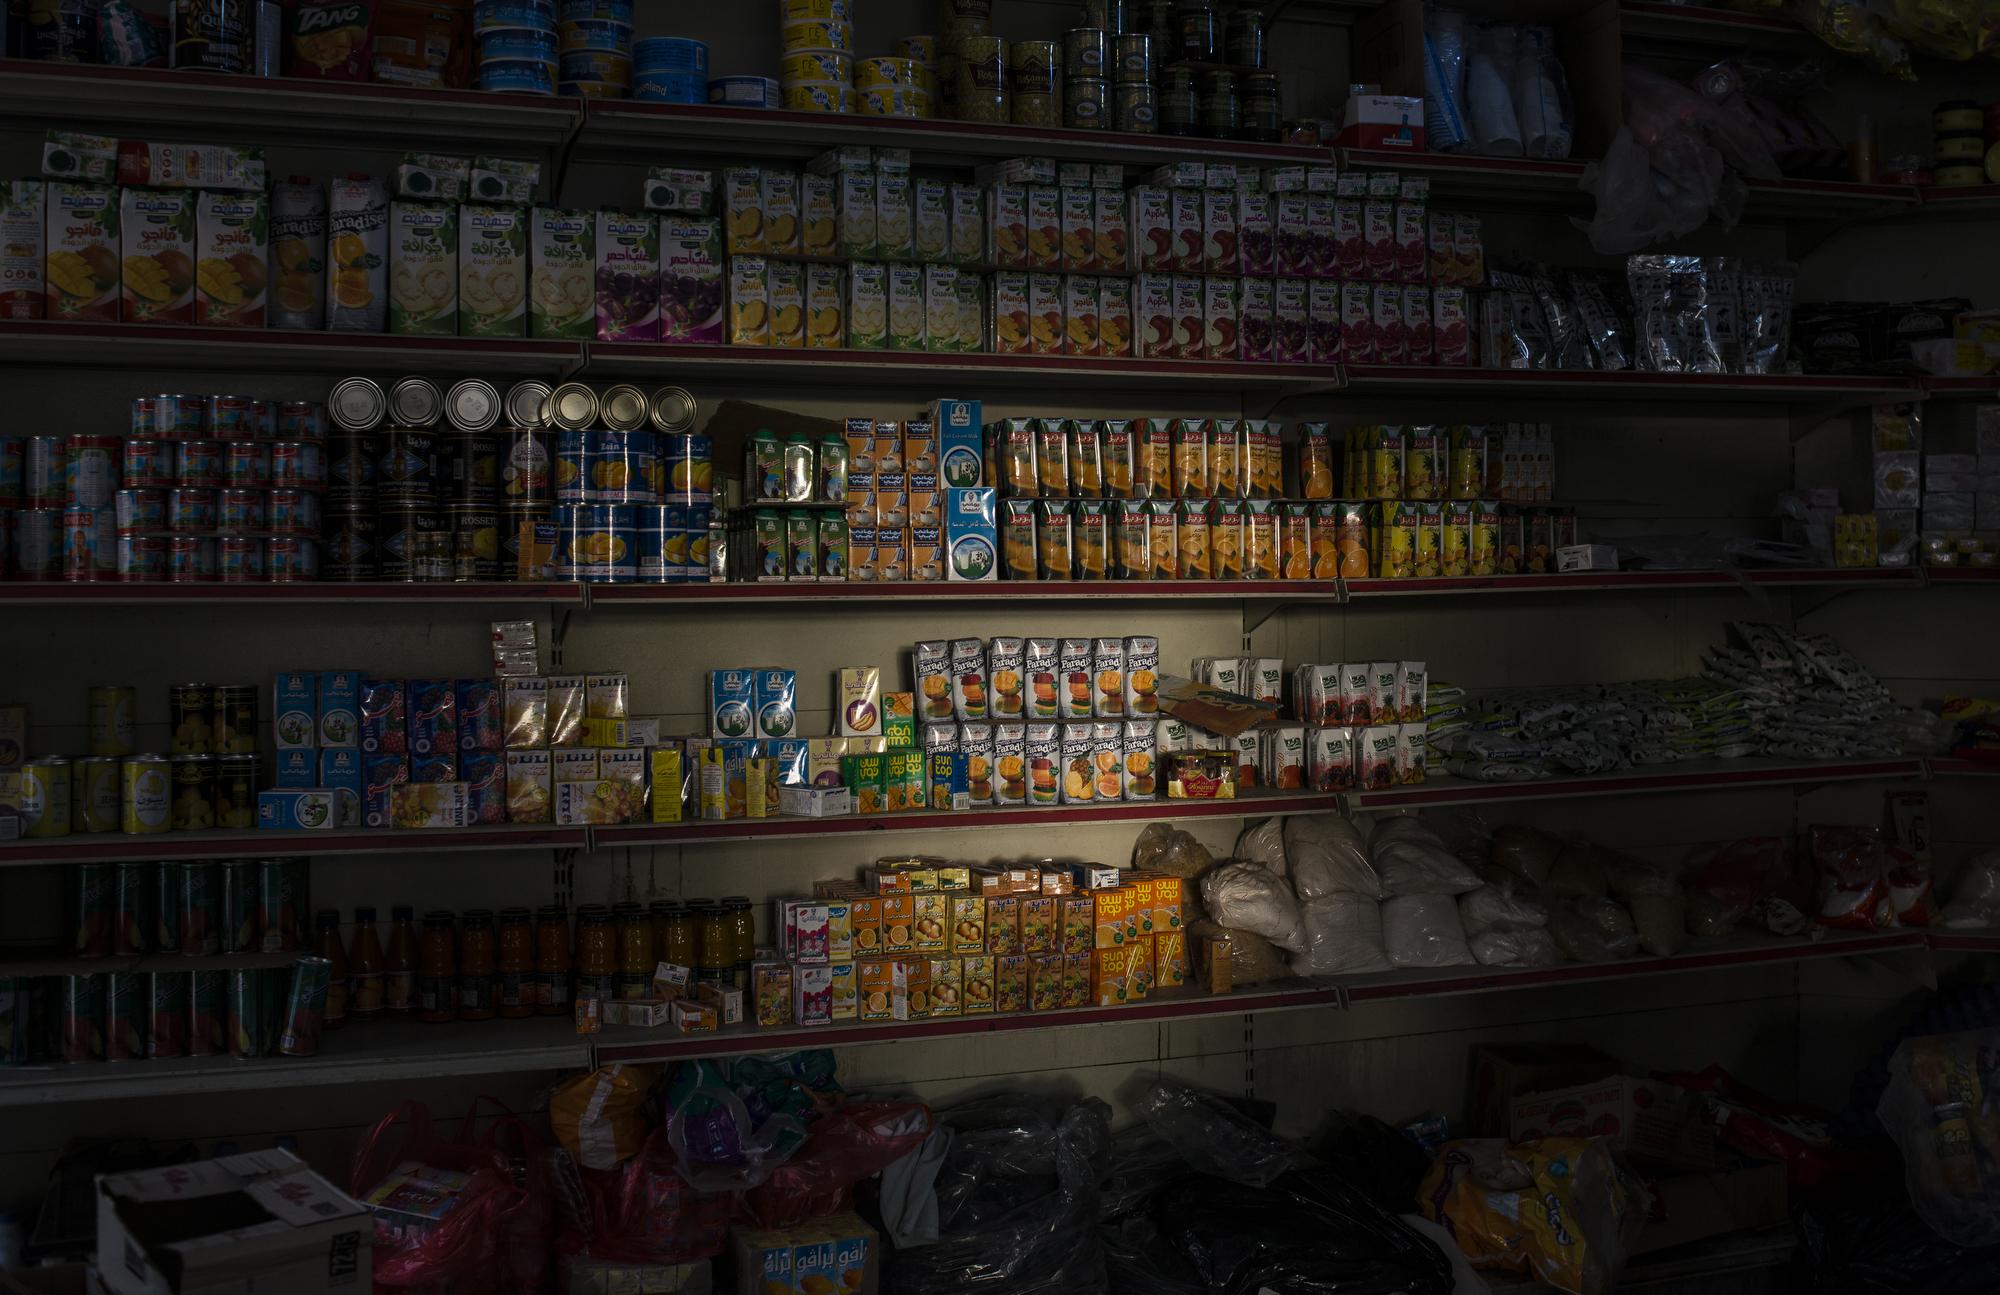 AlexPotter_Yemen_InterceptHealth_ContextPhotos_33.JPG